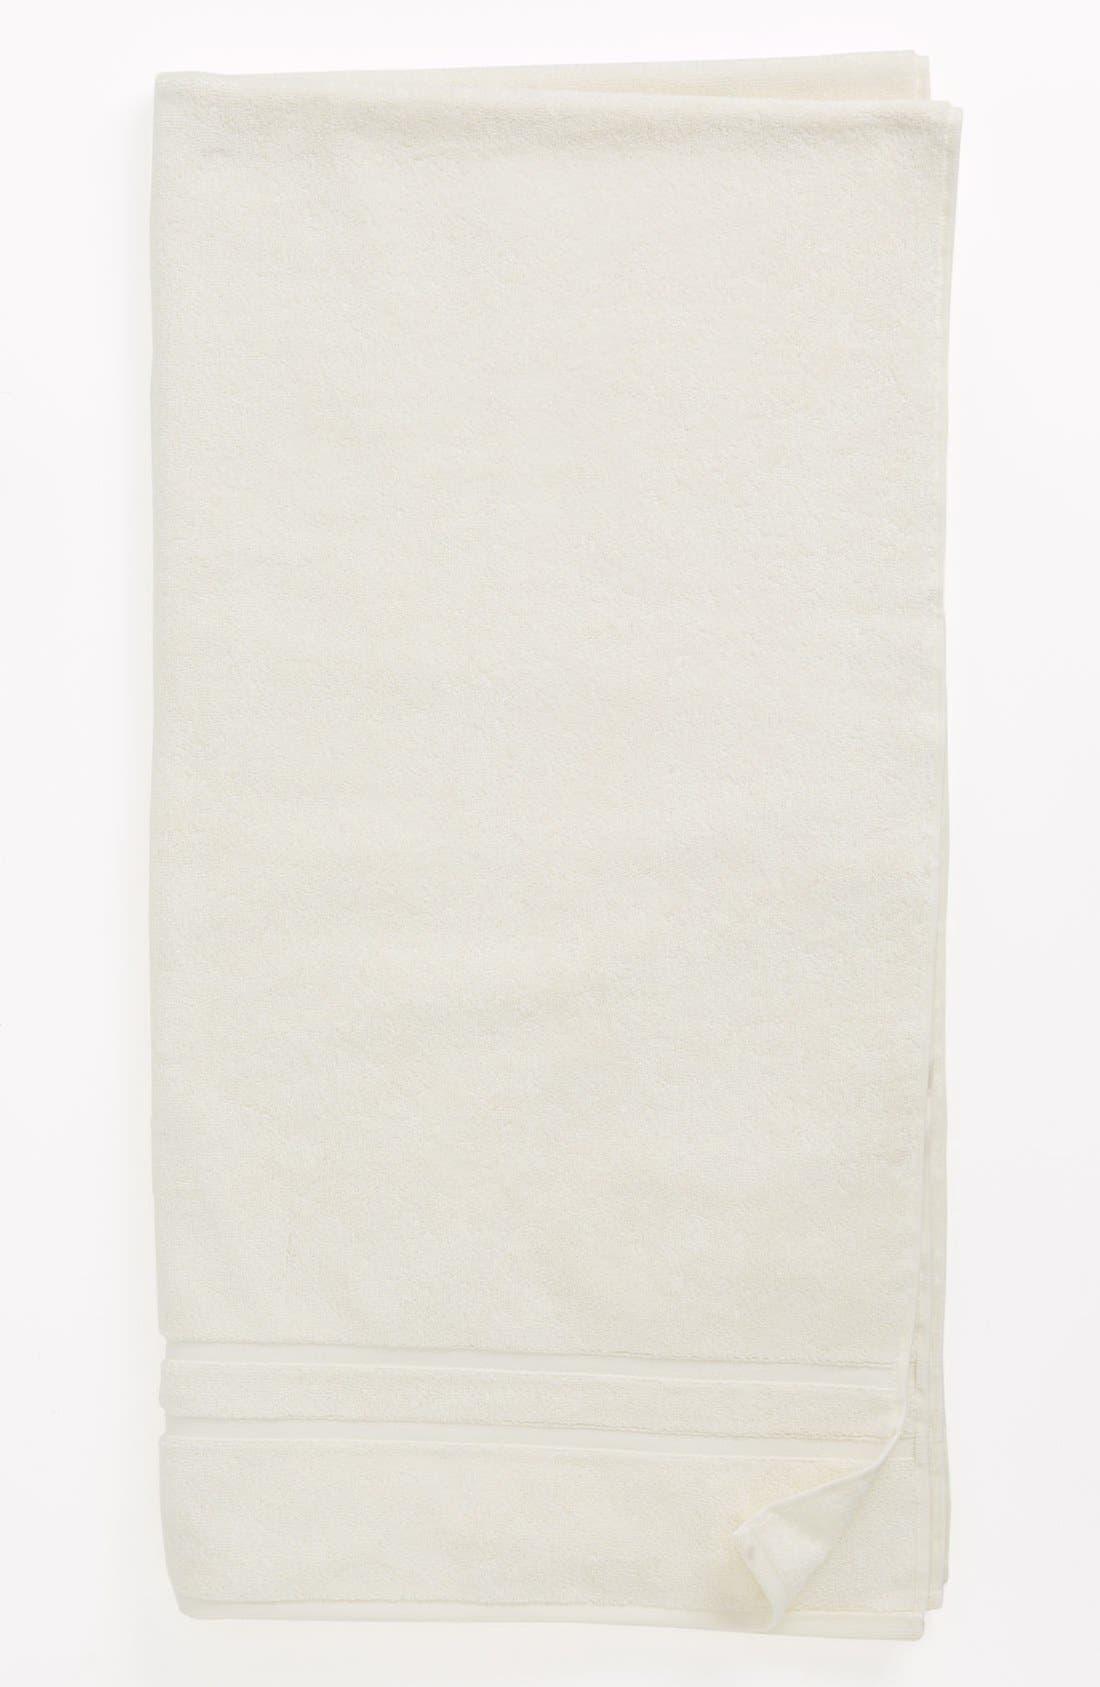 Alternate Image 1 Selected - Waterworks Studio Turkish Cotton Bath Sheet (Online Only)